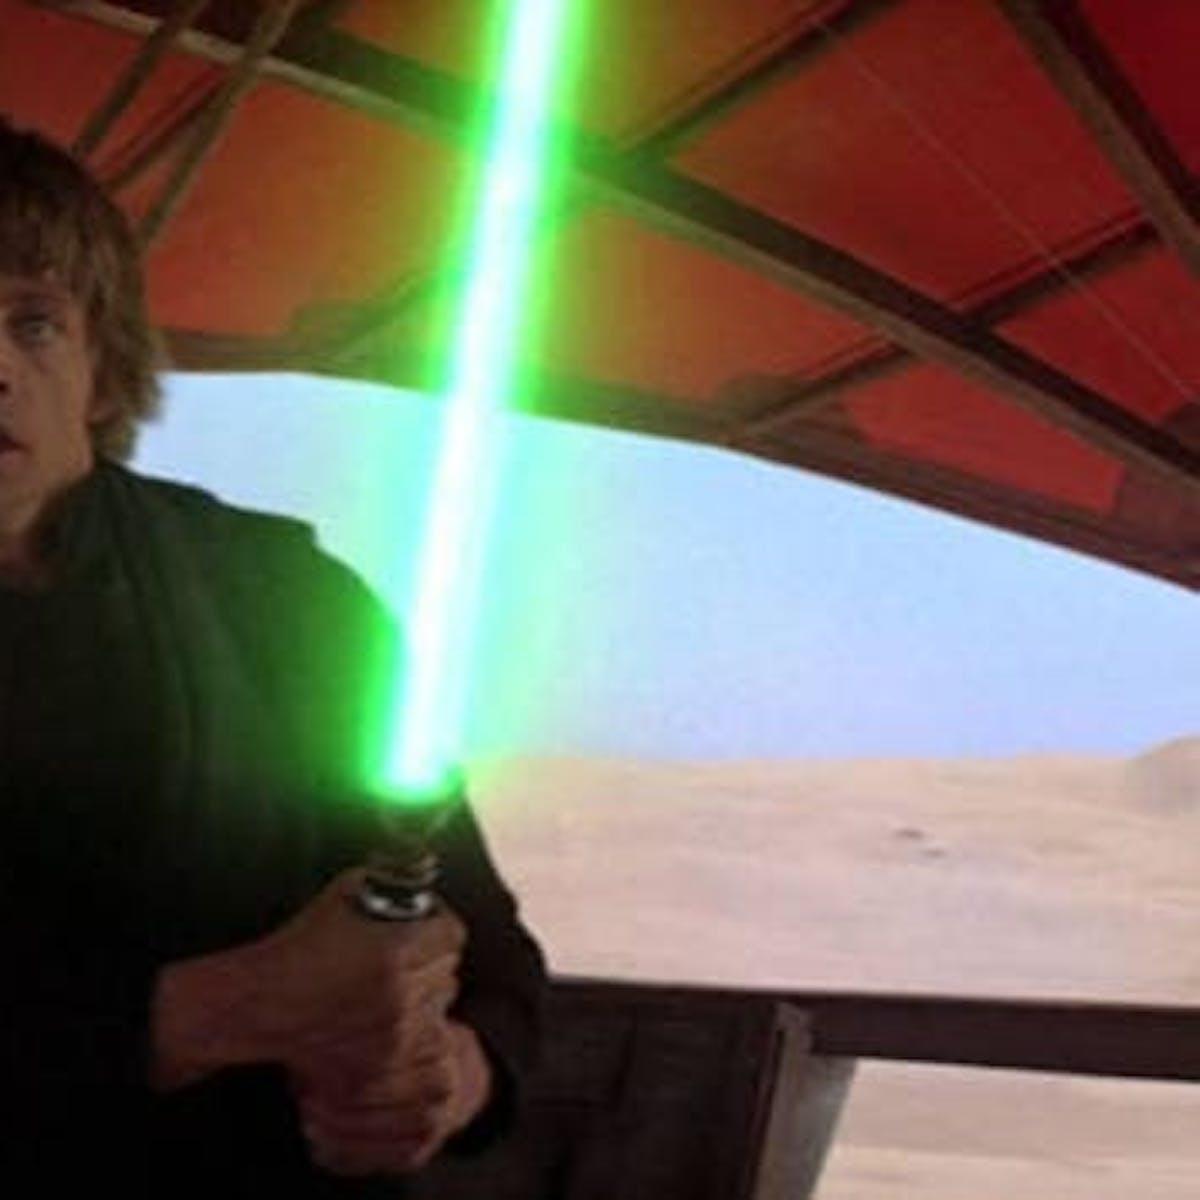 'Rise of Skywalker' concept art may reveal fate of Luke's green lightsaber